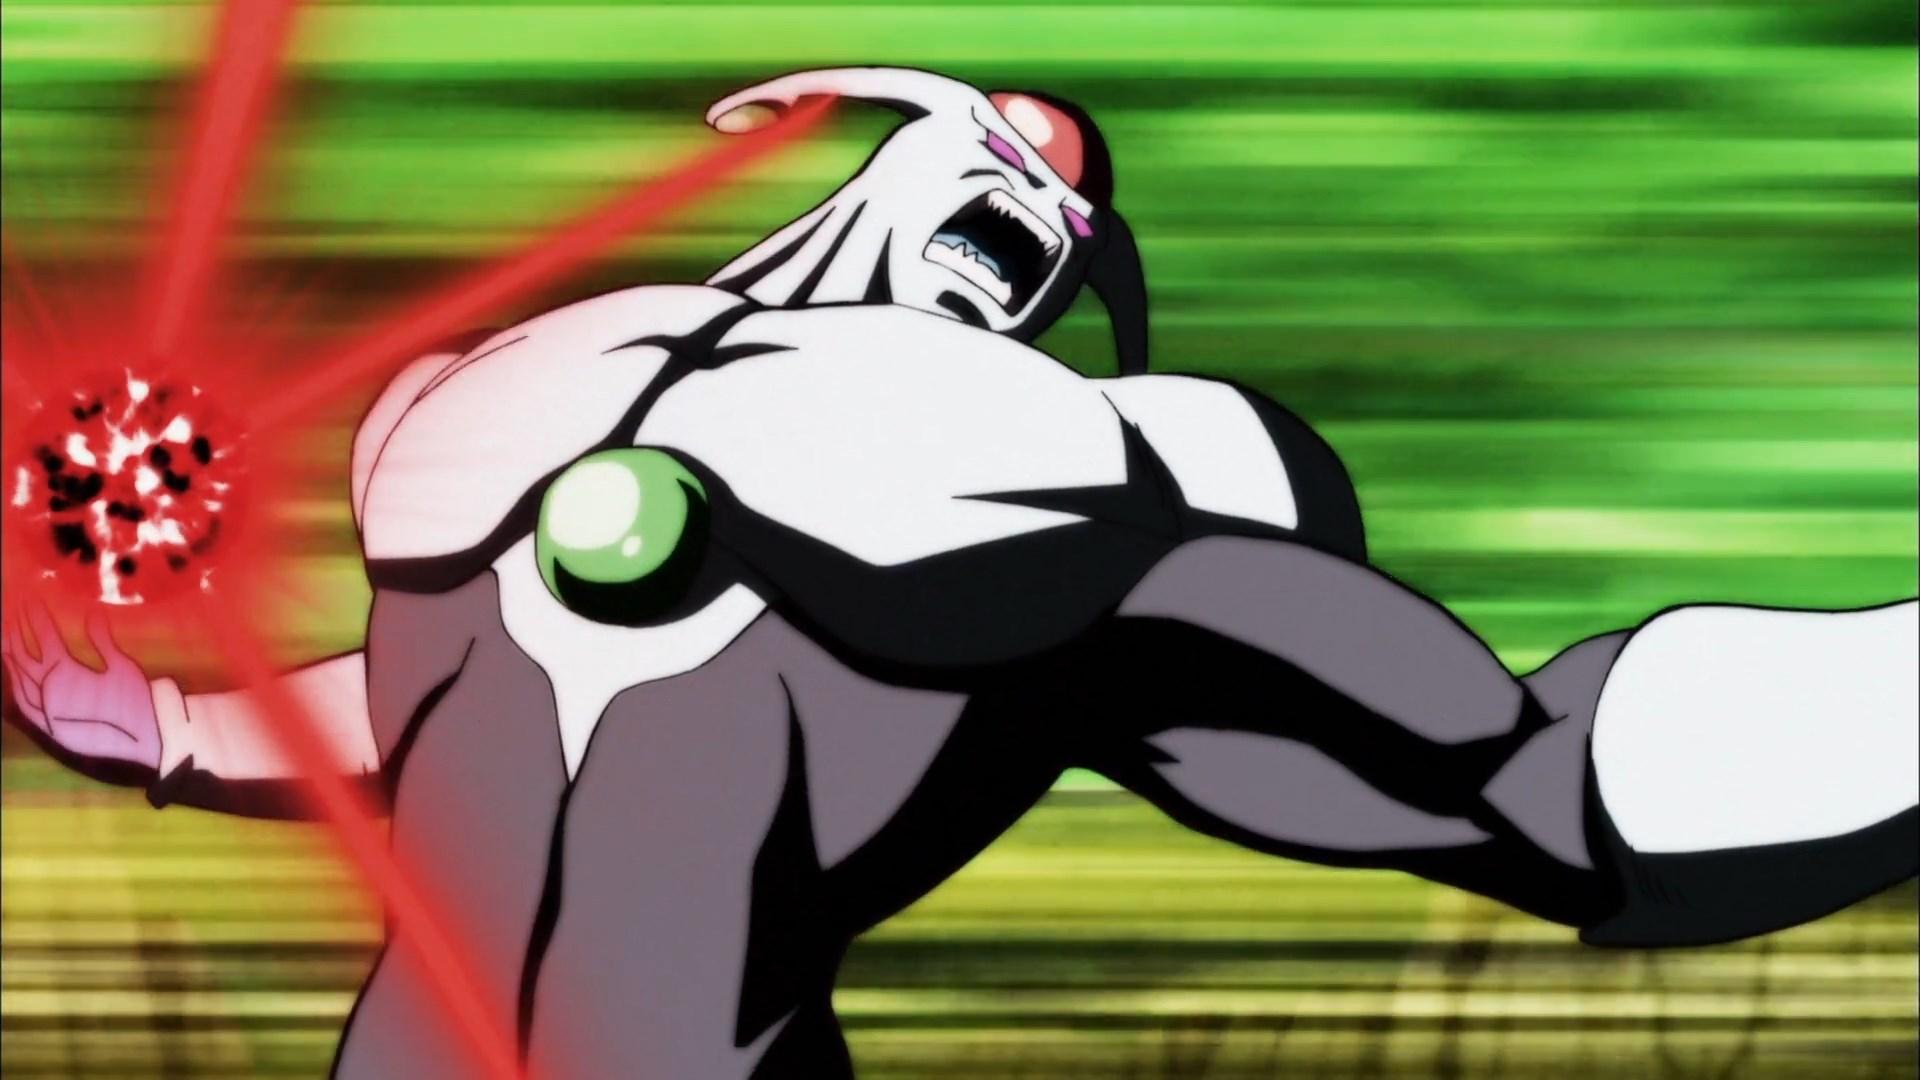 [HorribleSubs] Dragon Ball Super - 121 [1080p].mkv_snapshot_14.18